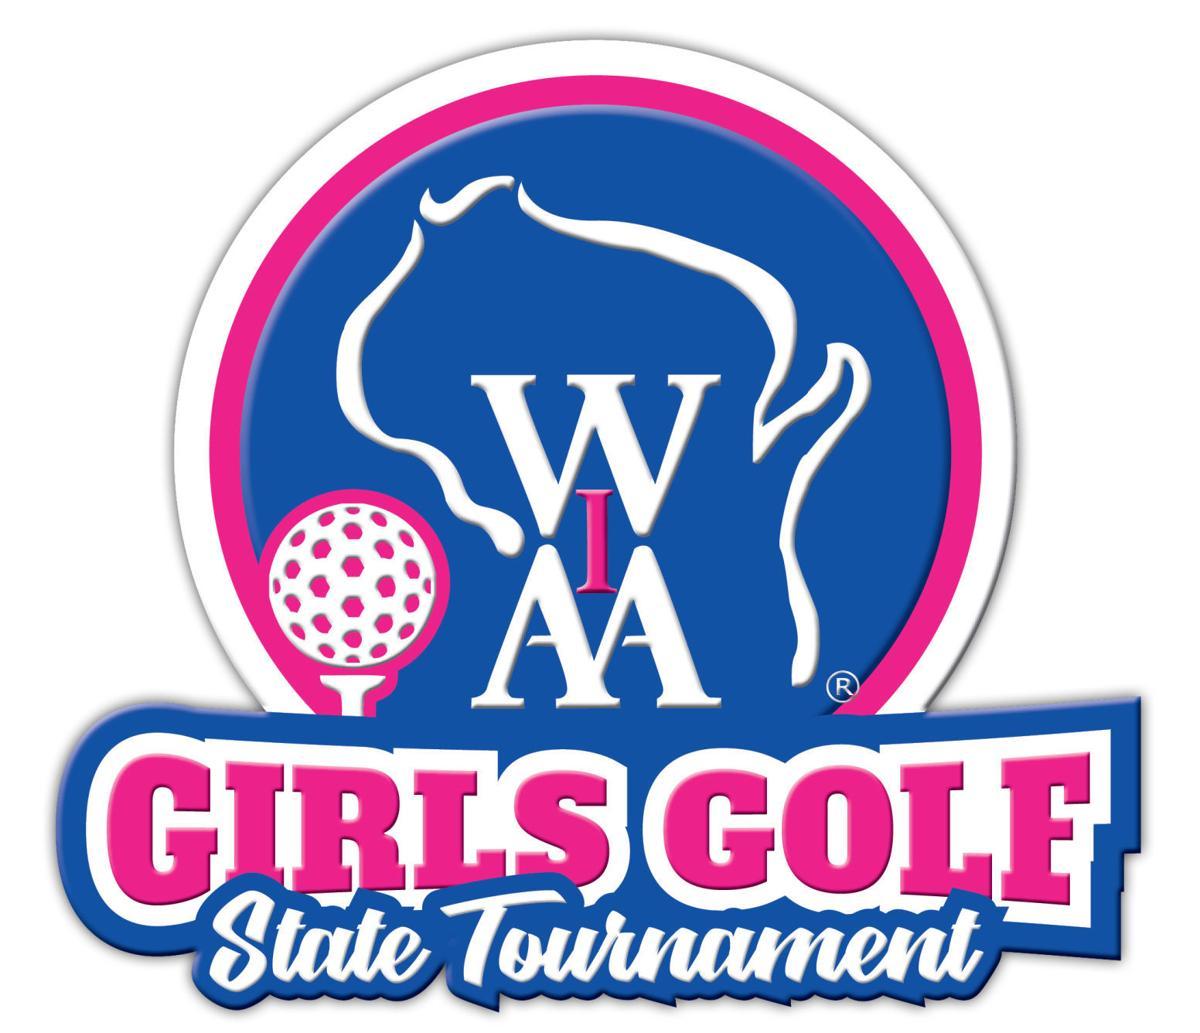 WIAA state girls golf logo